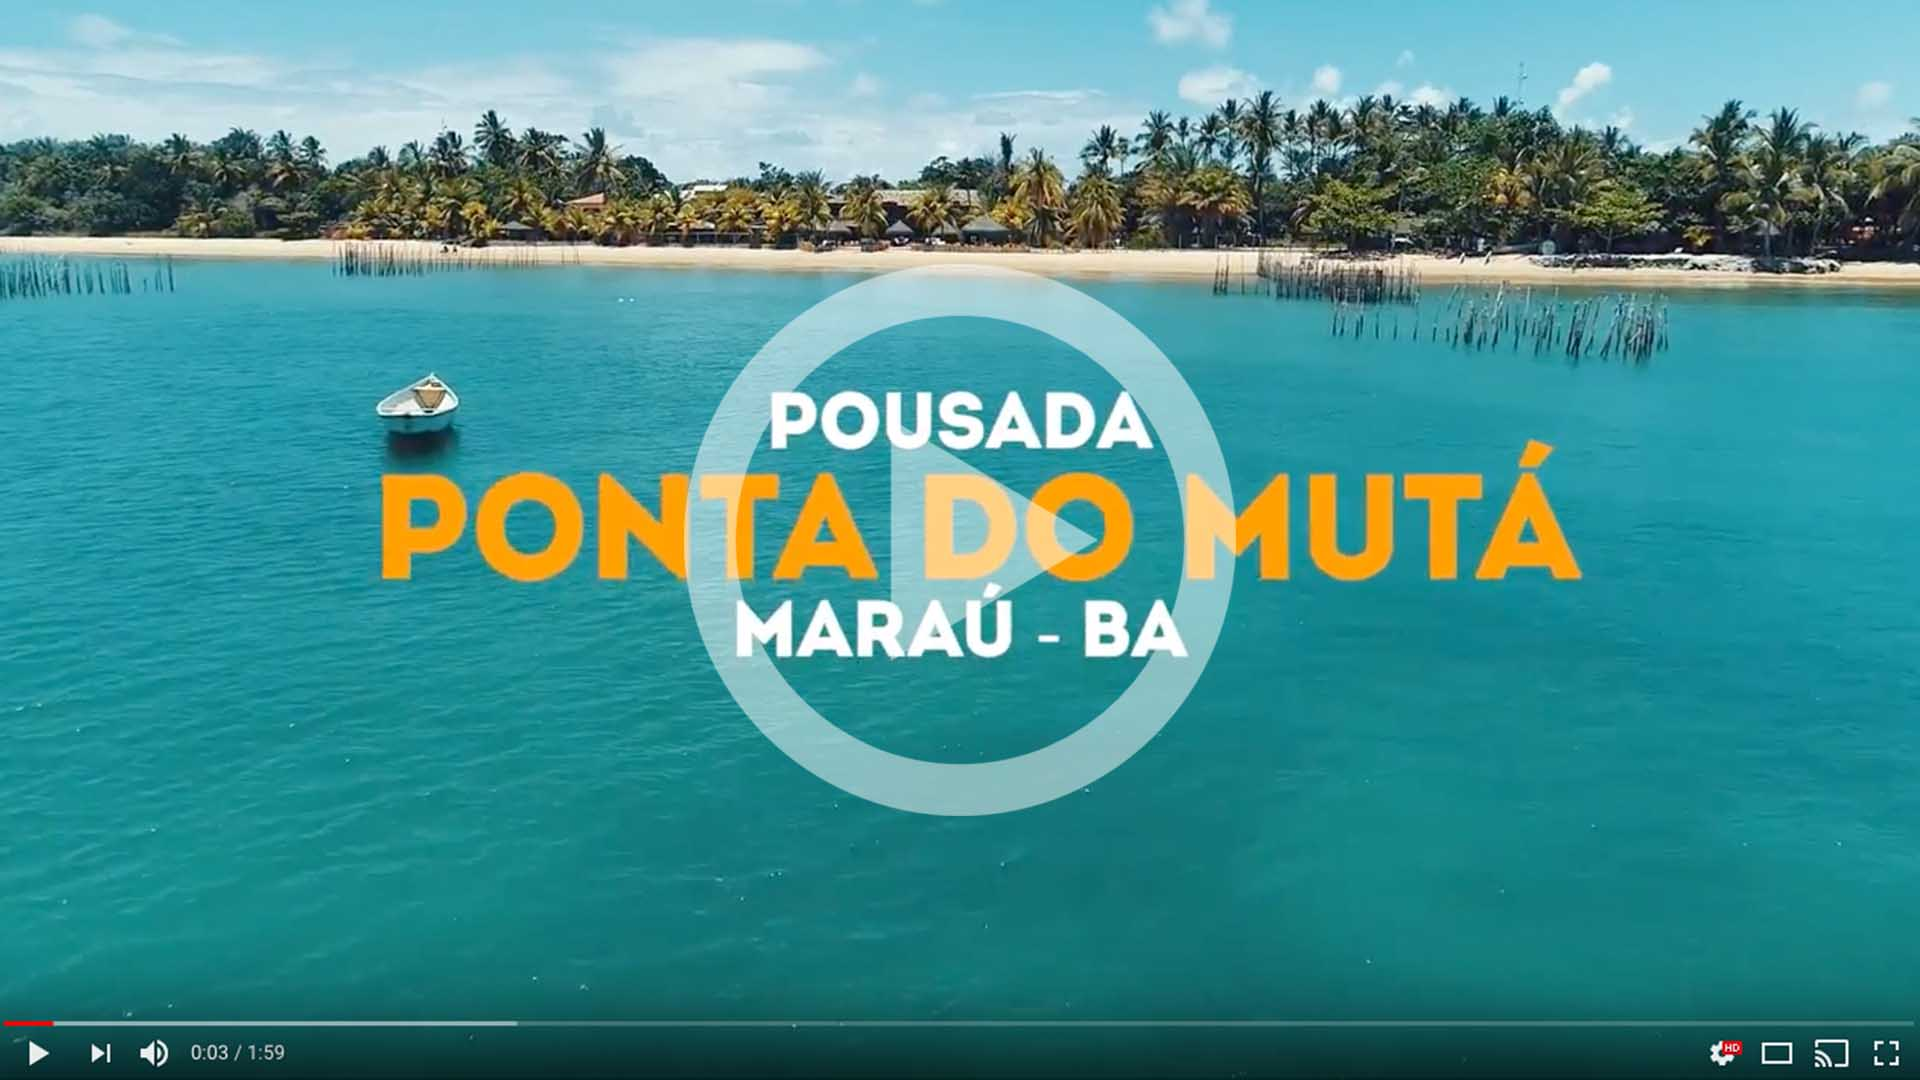 Pousada Ponta do Mutá